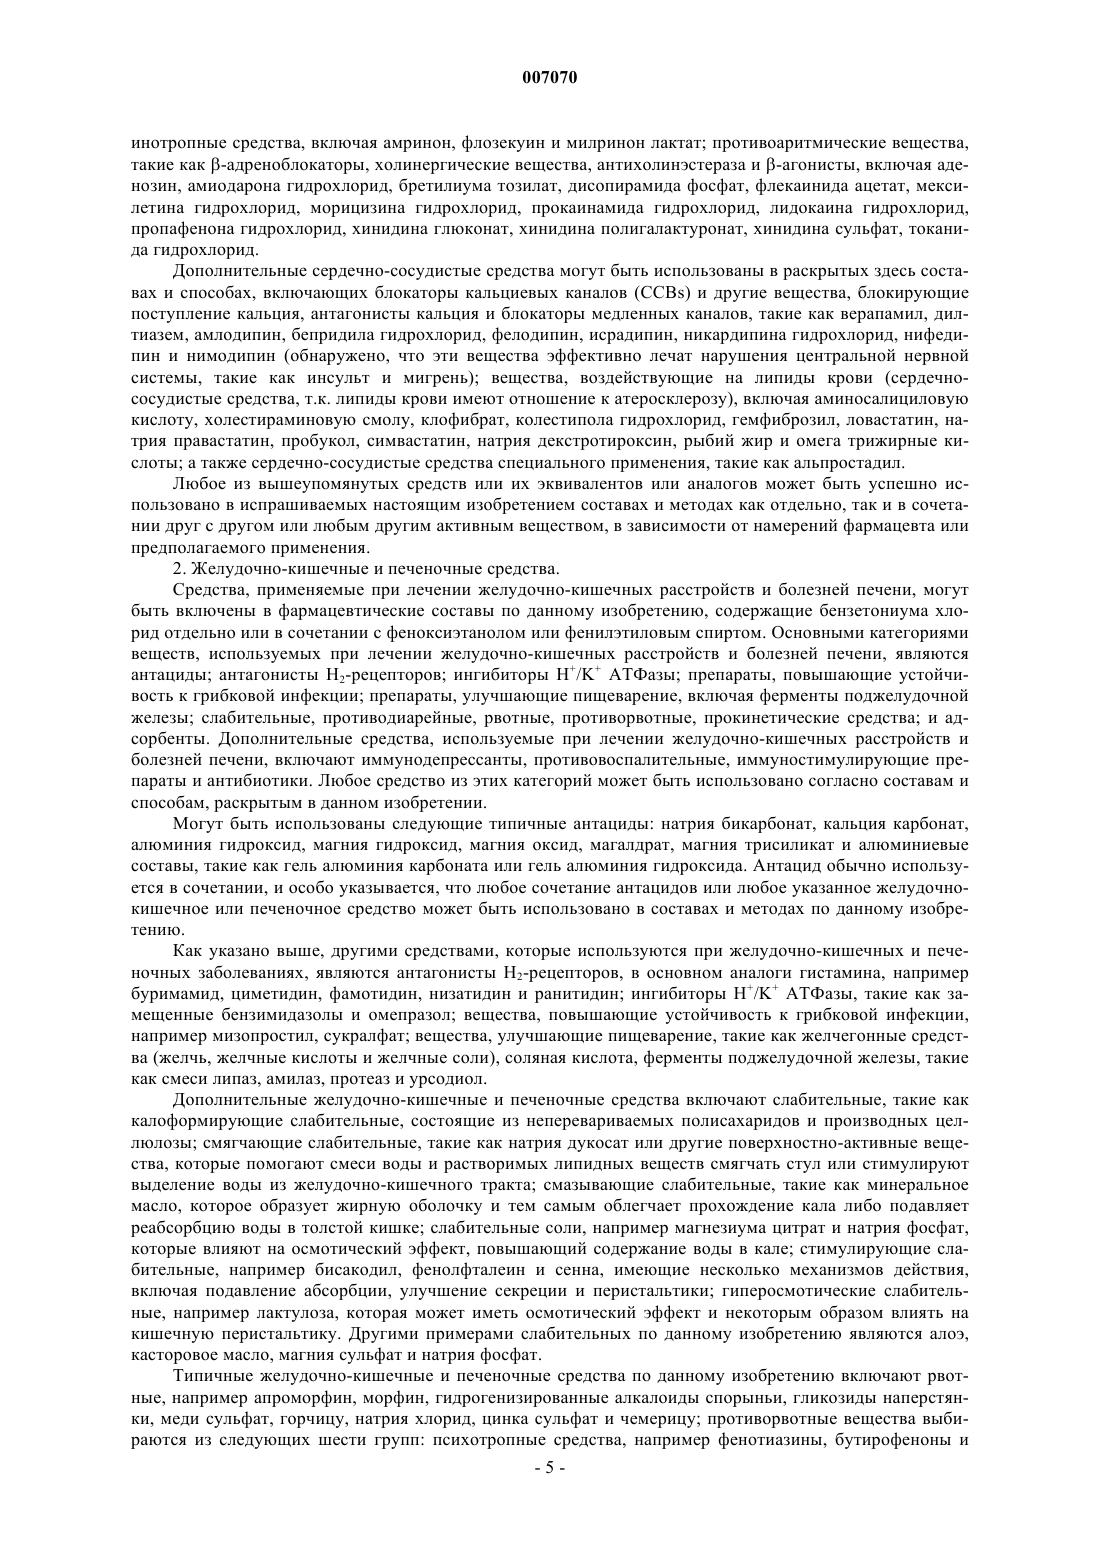 Хлормезанон